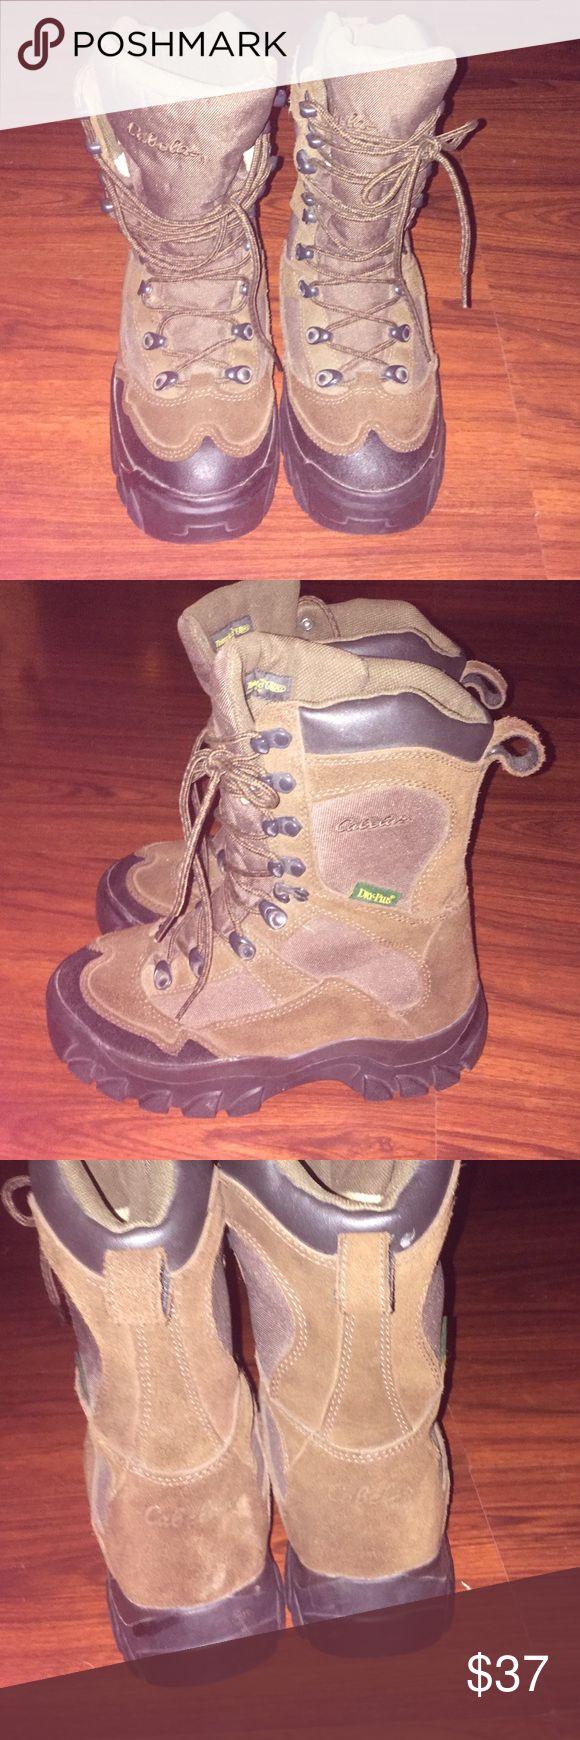 Cabelas Women's insulated Boots 7D Cabelas Women's insulated Boots 7D. Excellent condition cabelas Shoes Winter & Rain Boots